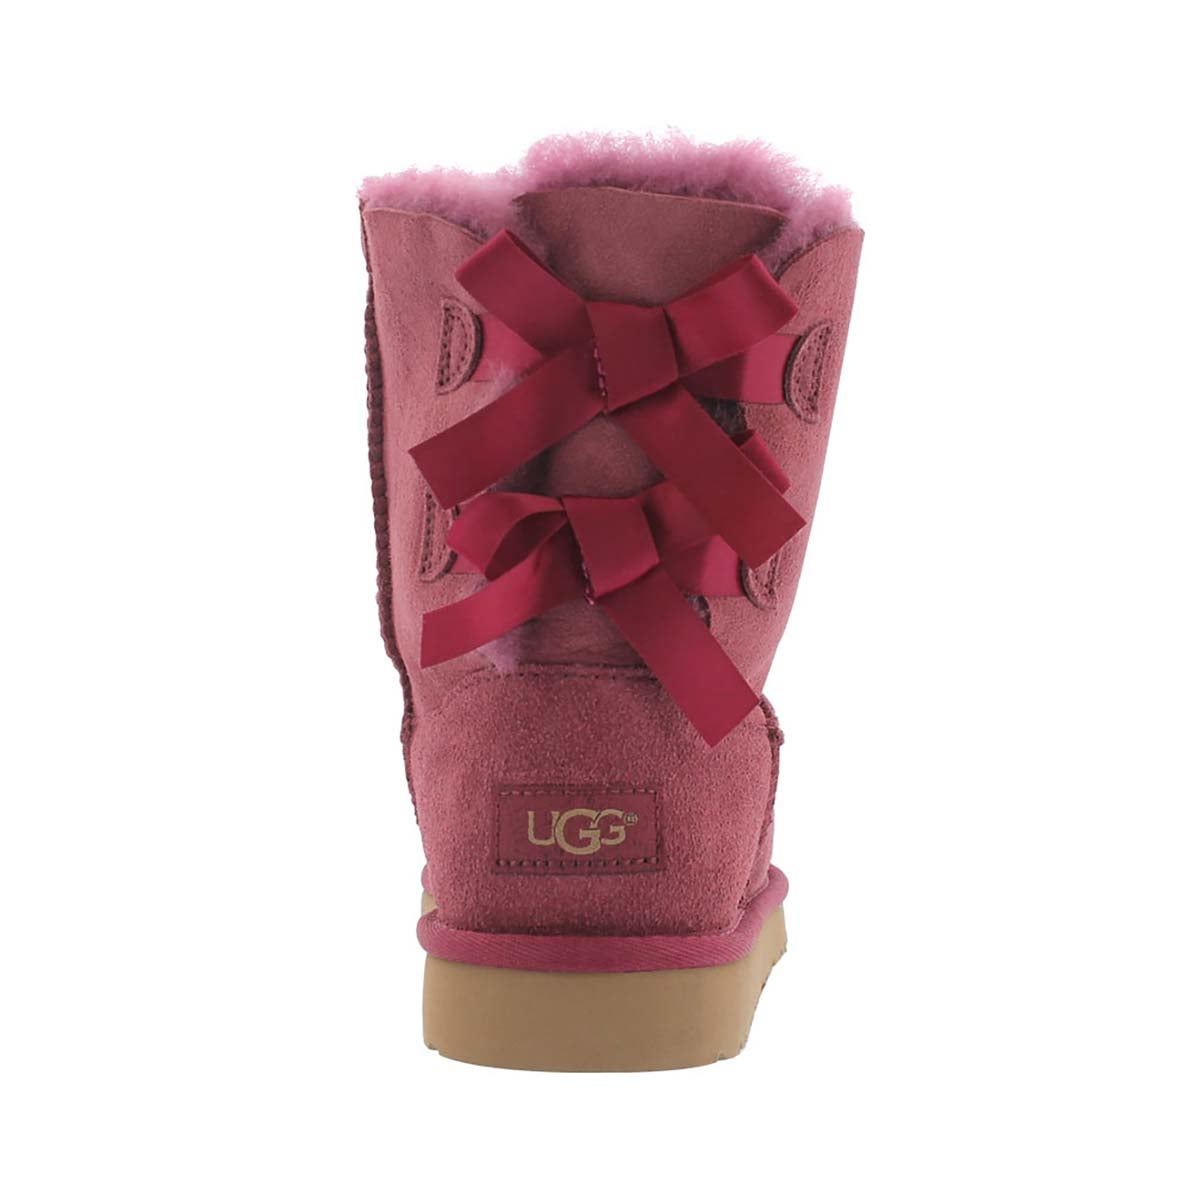 Grls Bailey Bow boug sheepskin boot